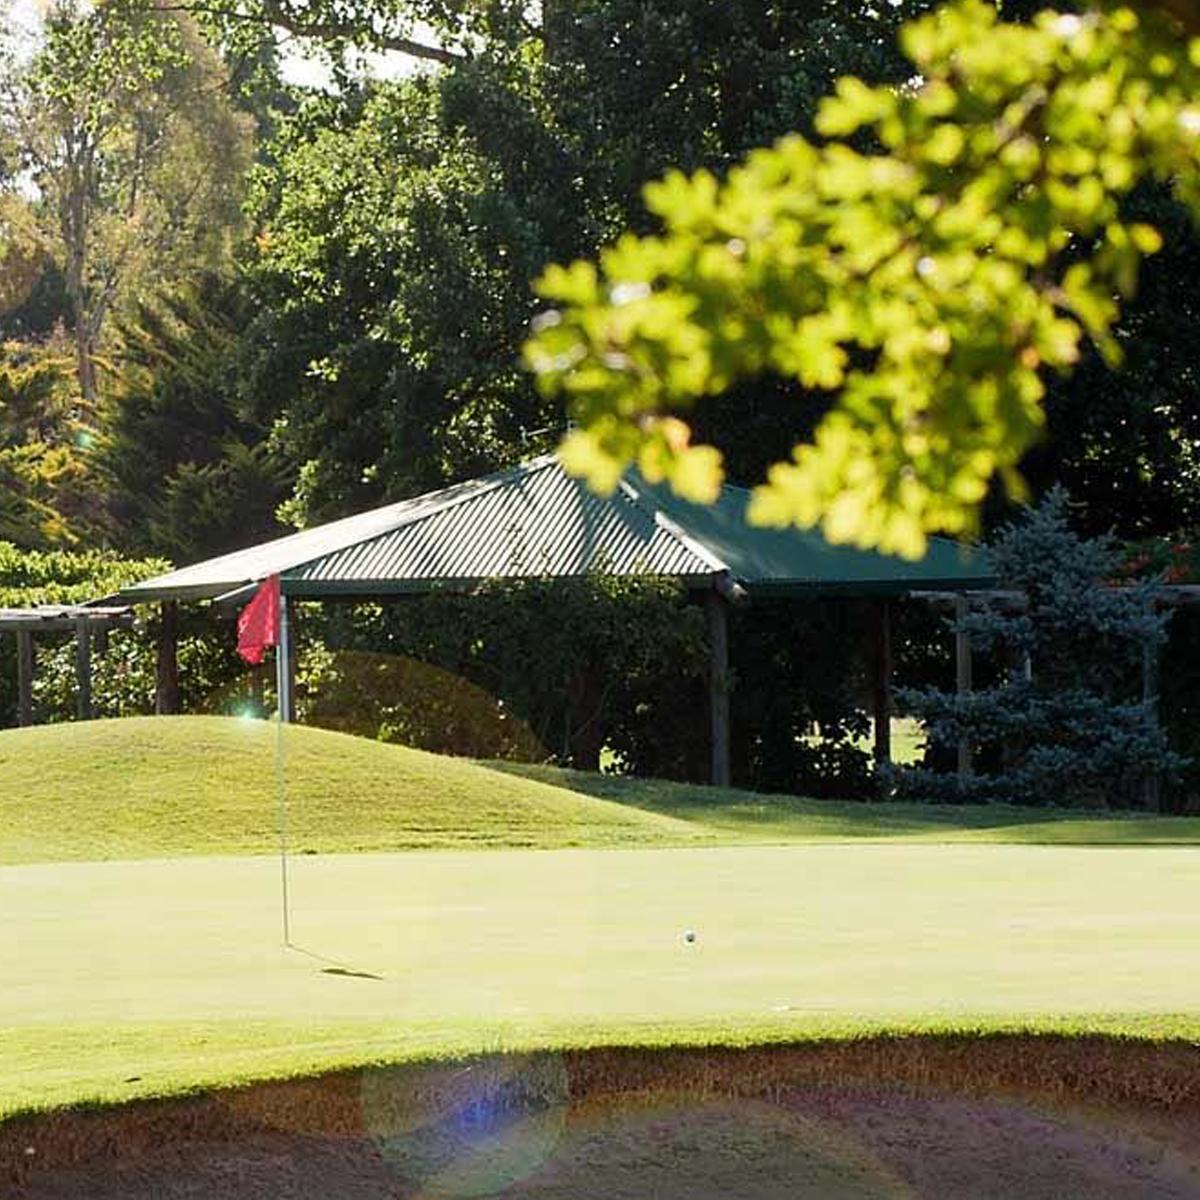 Views of the golf course at Goulburn Golf Club